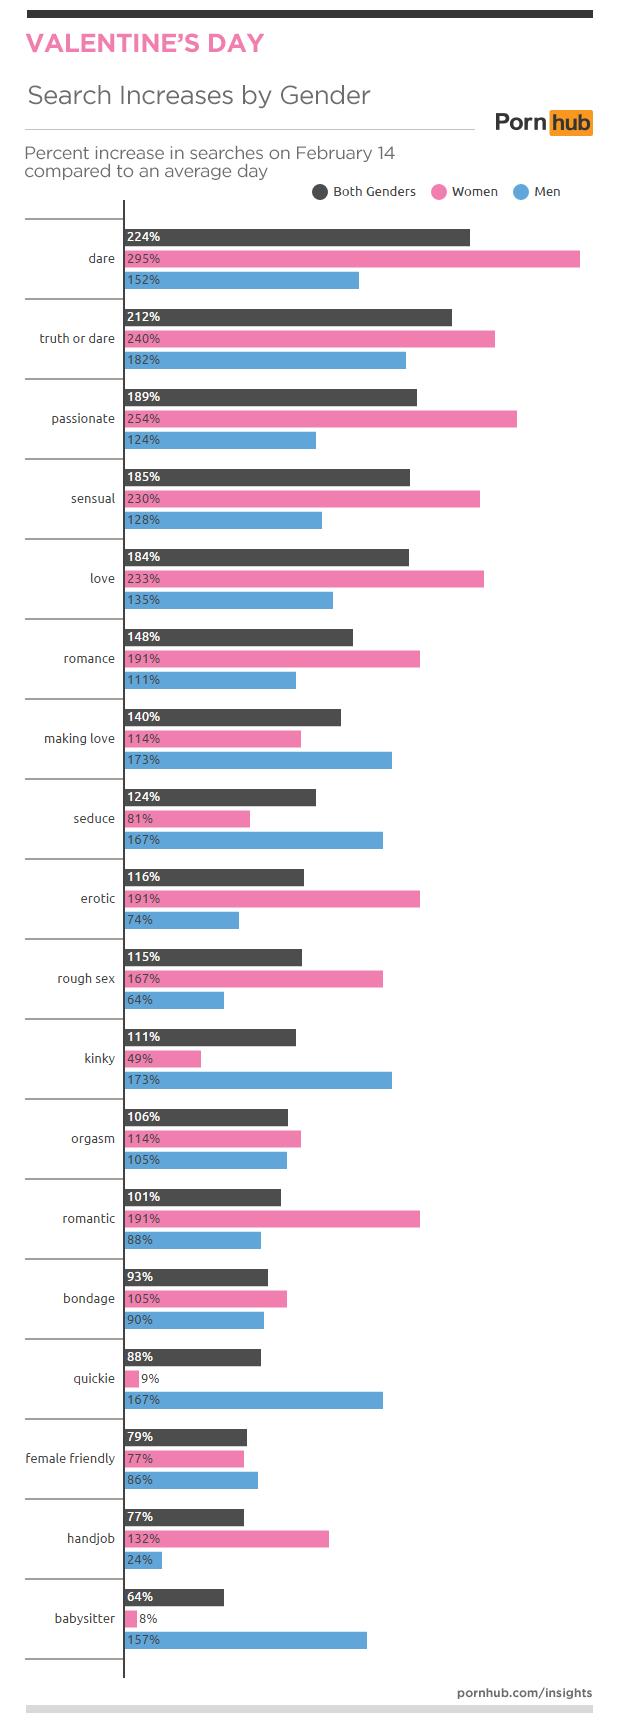 pornhub-insights-2016-valentines-men-women-searches